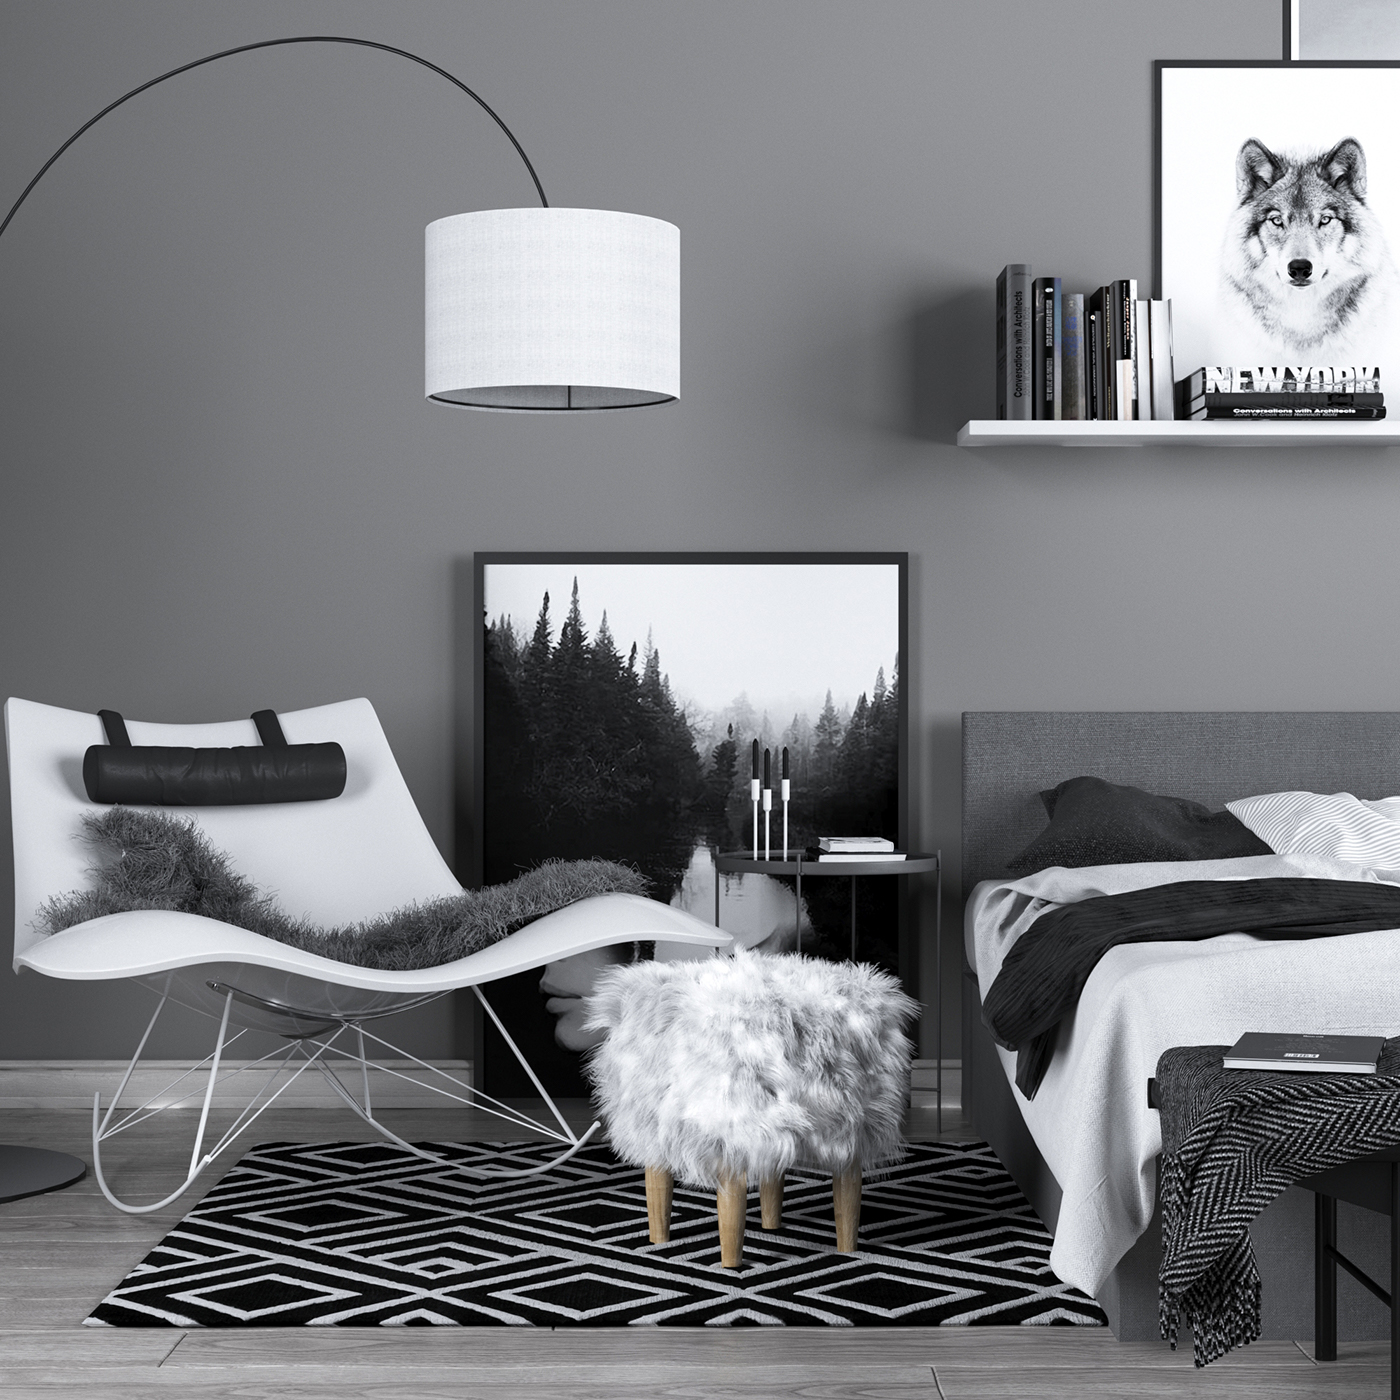 Monochrome scandinavian interior on Behance